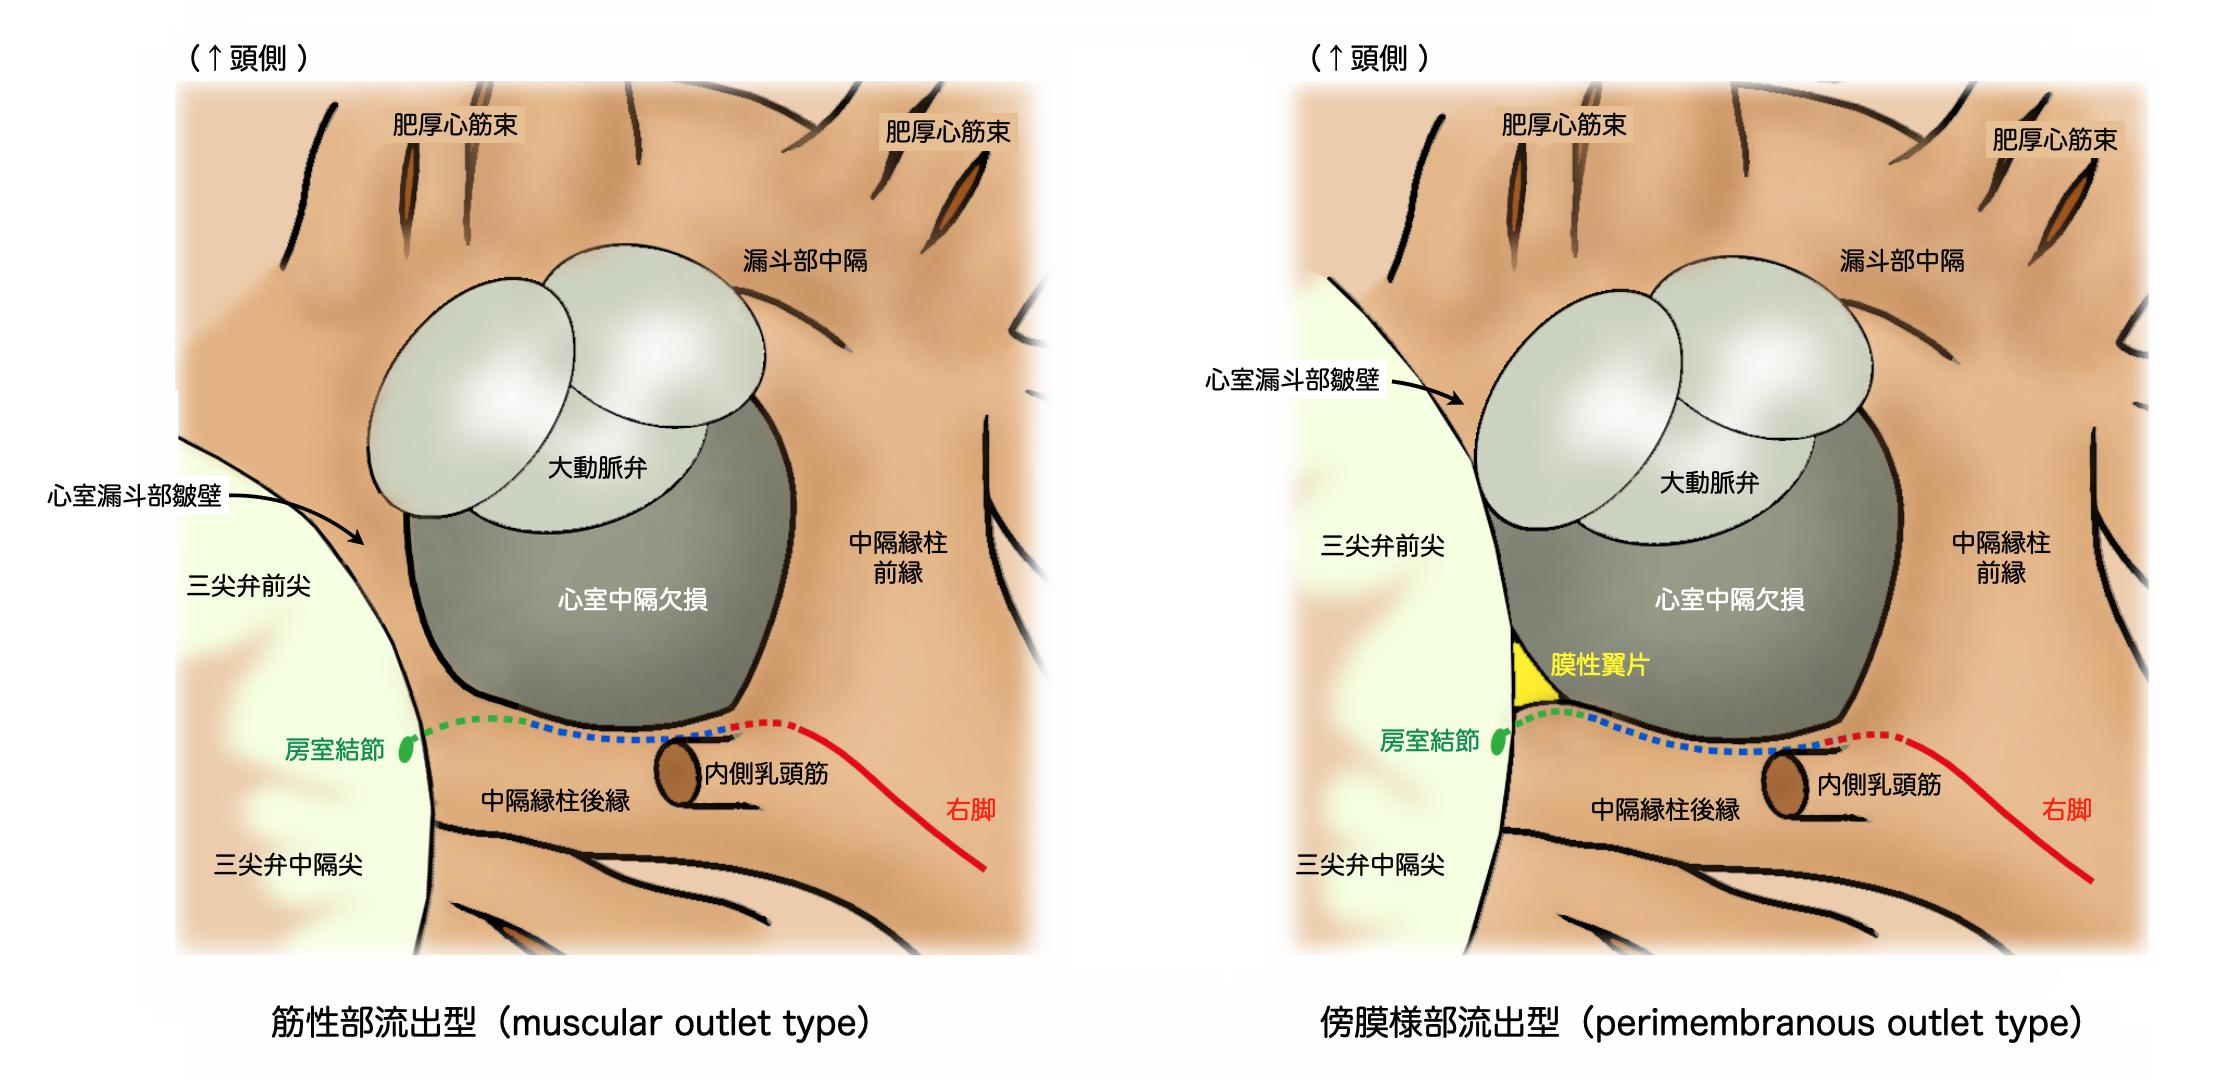 傍膜様部流出型(perimembranous outlet type)、筋性部流出型(muscular outlet type)